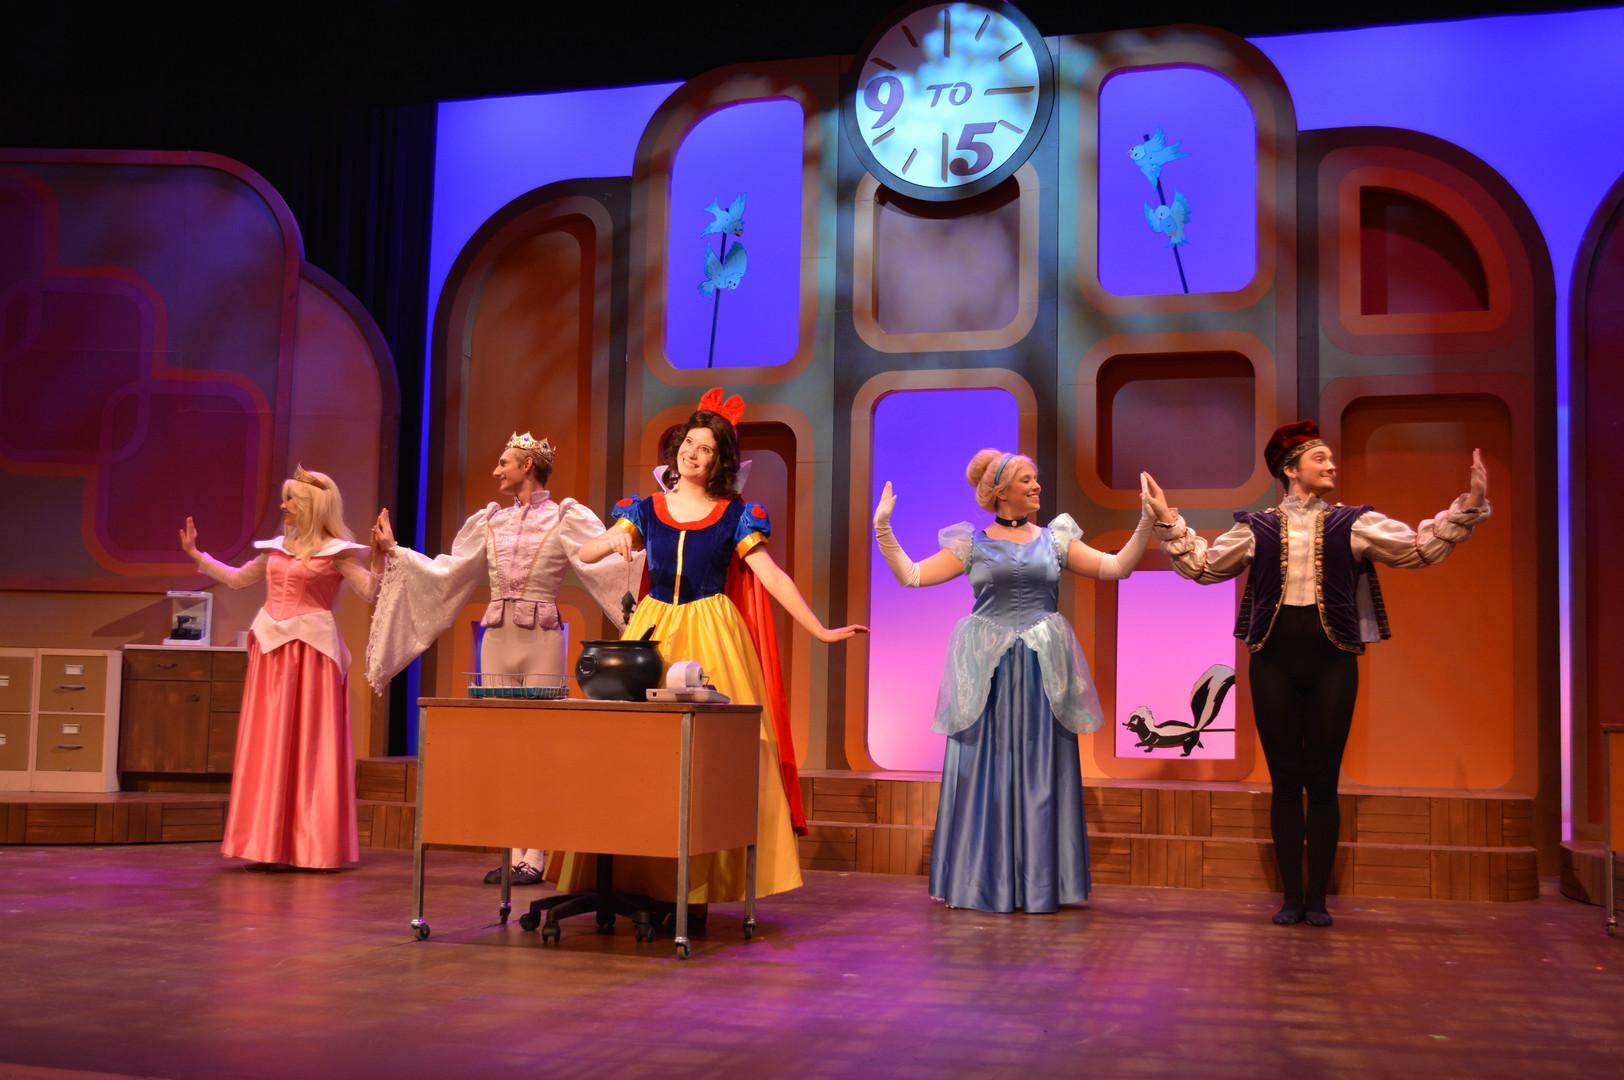 9 to 5 (Cinderella dress) - Millikin University